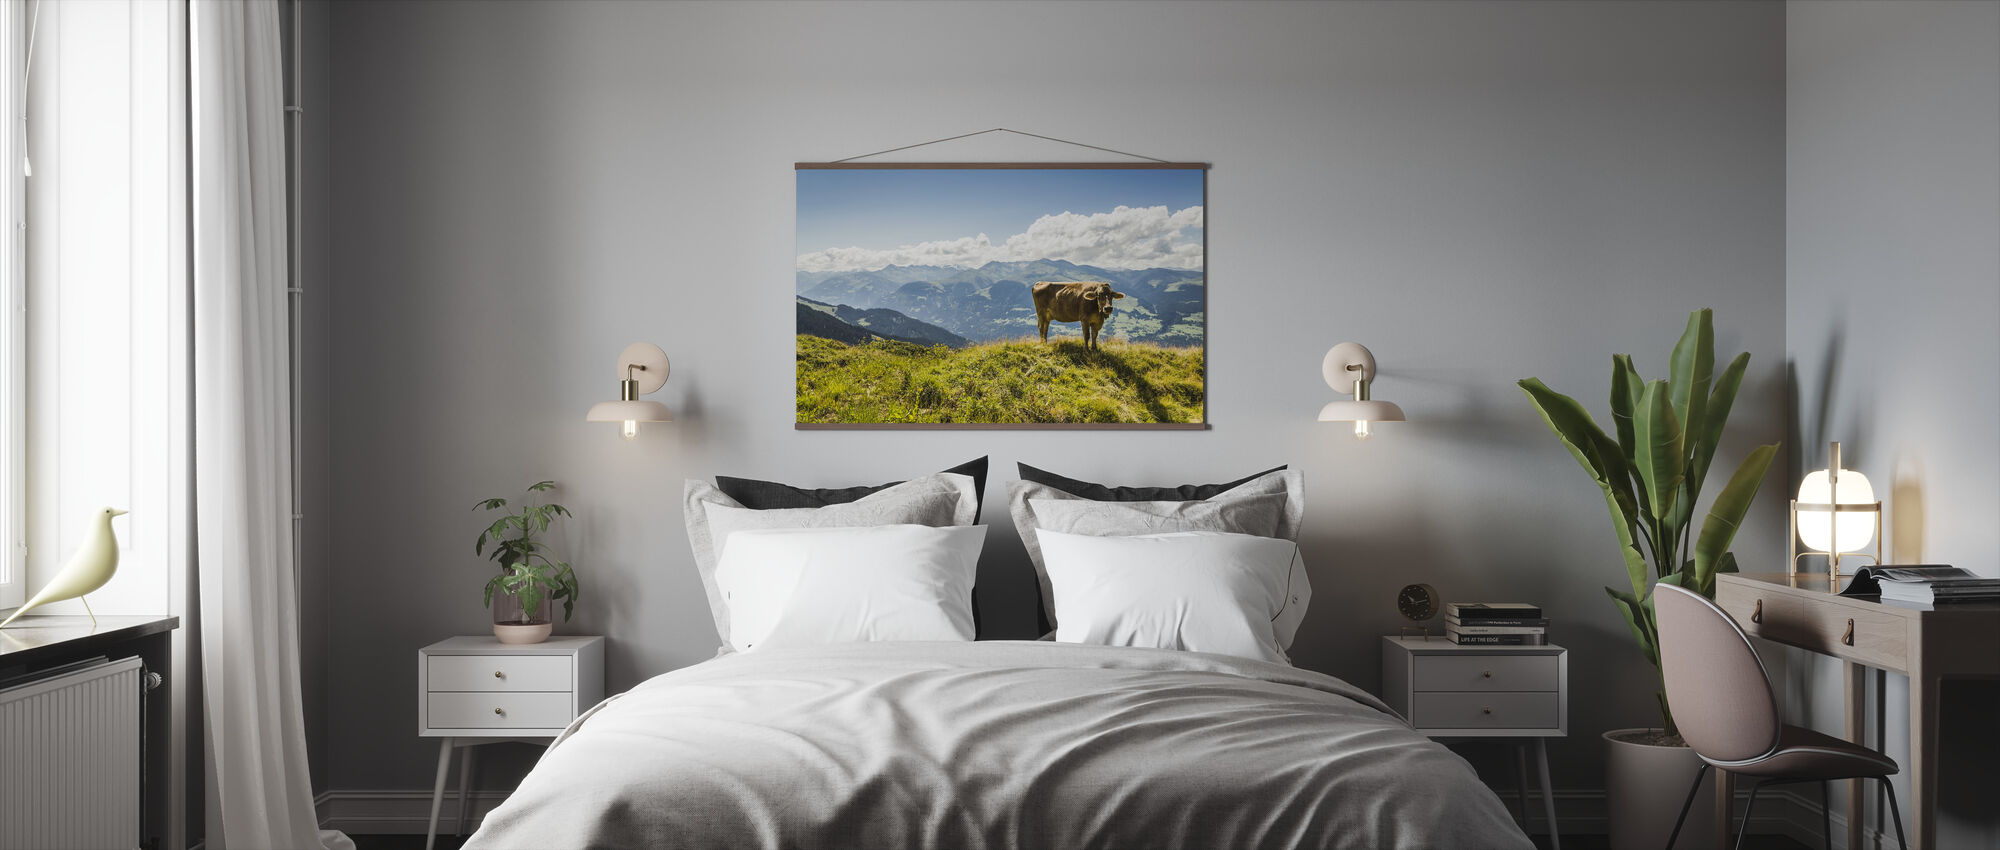 Cow Grazing on Grassy Hillside - Poster - Bedroom